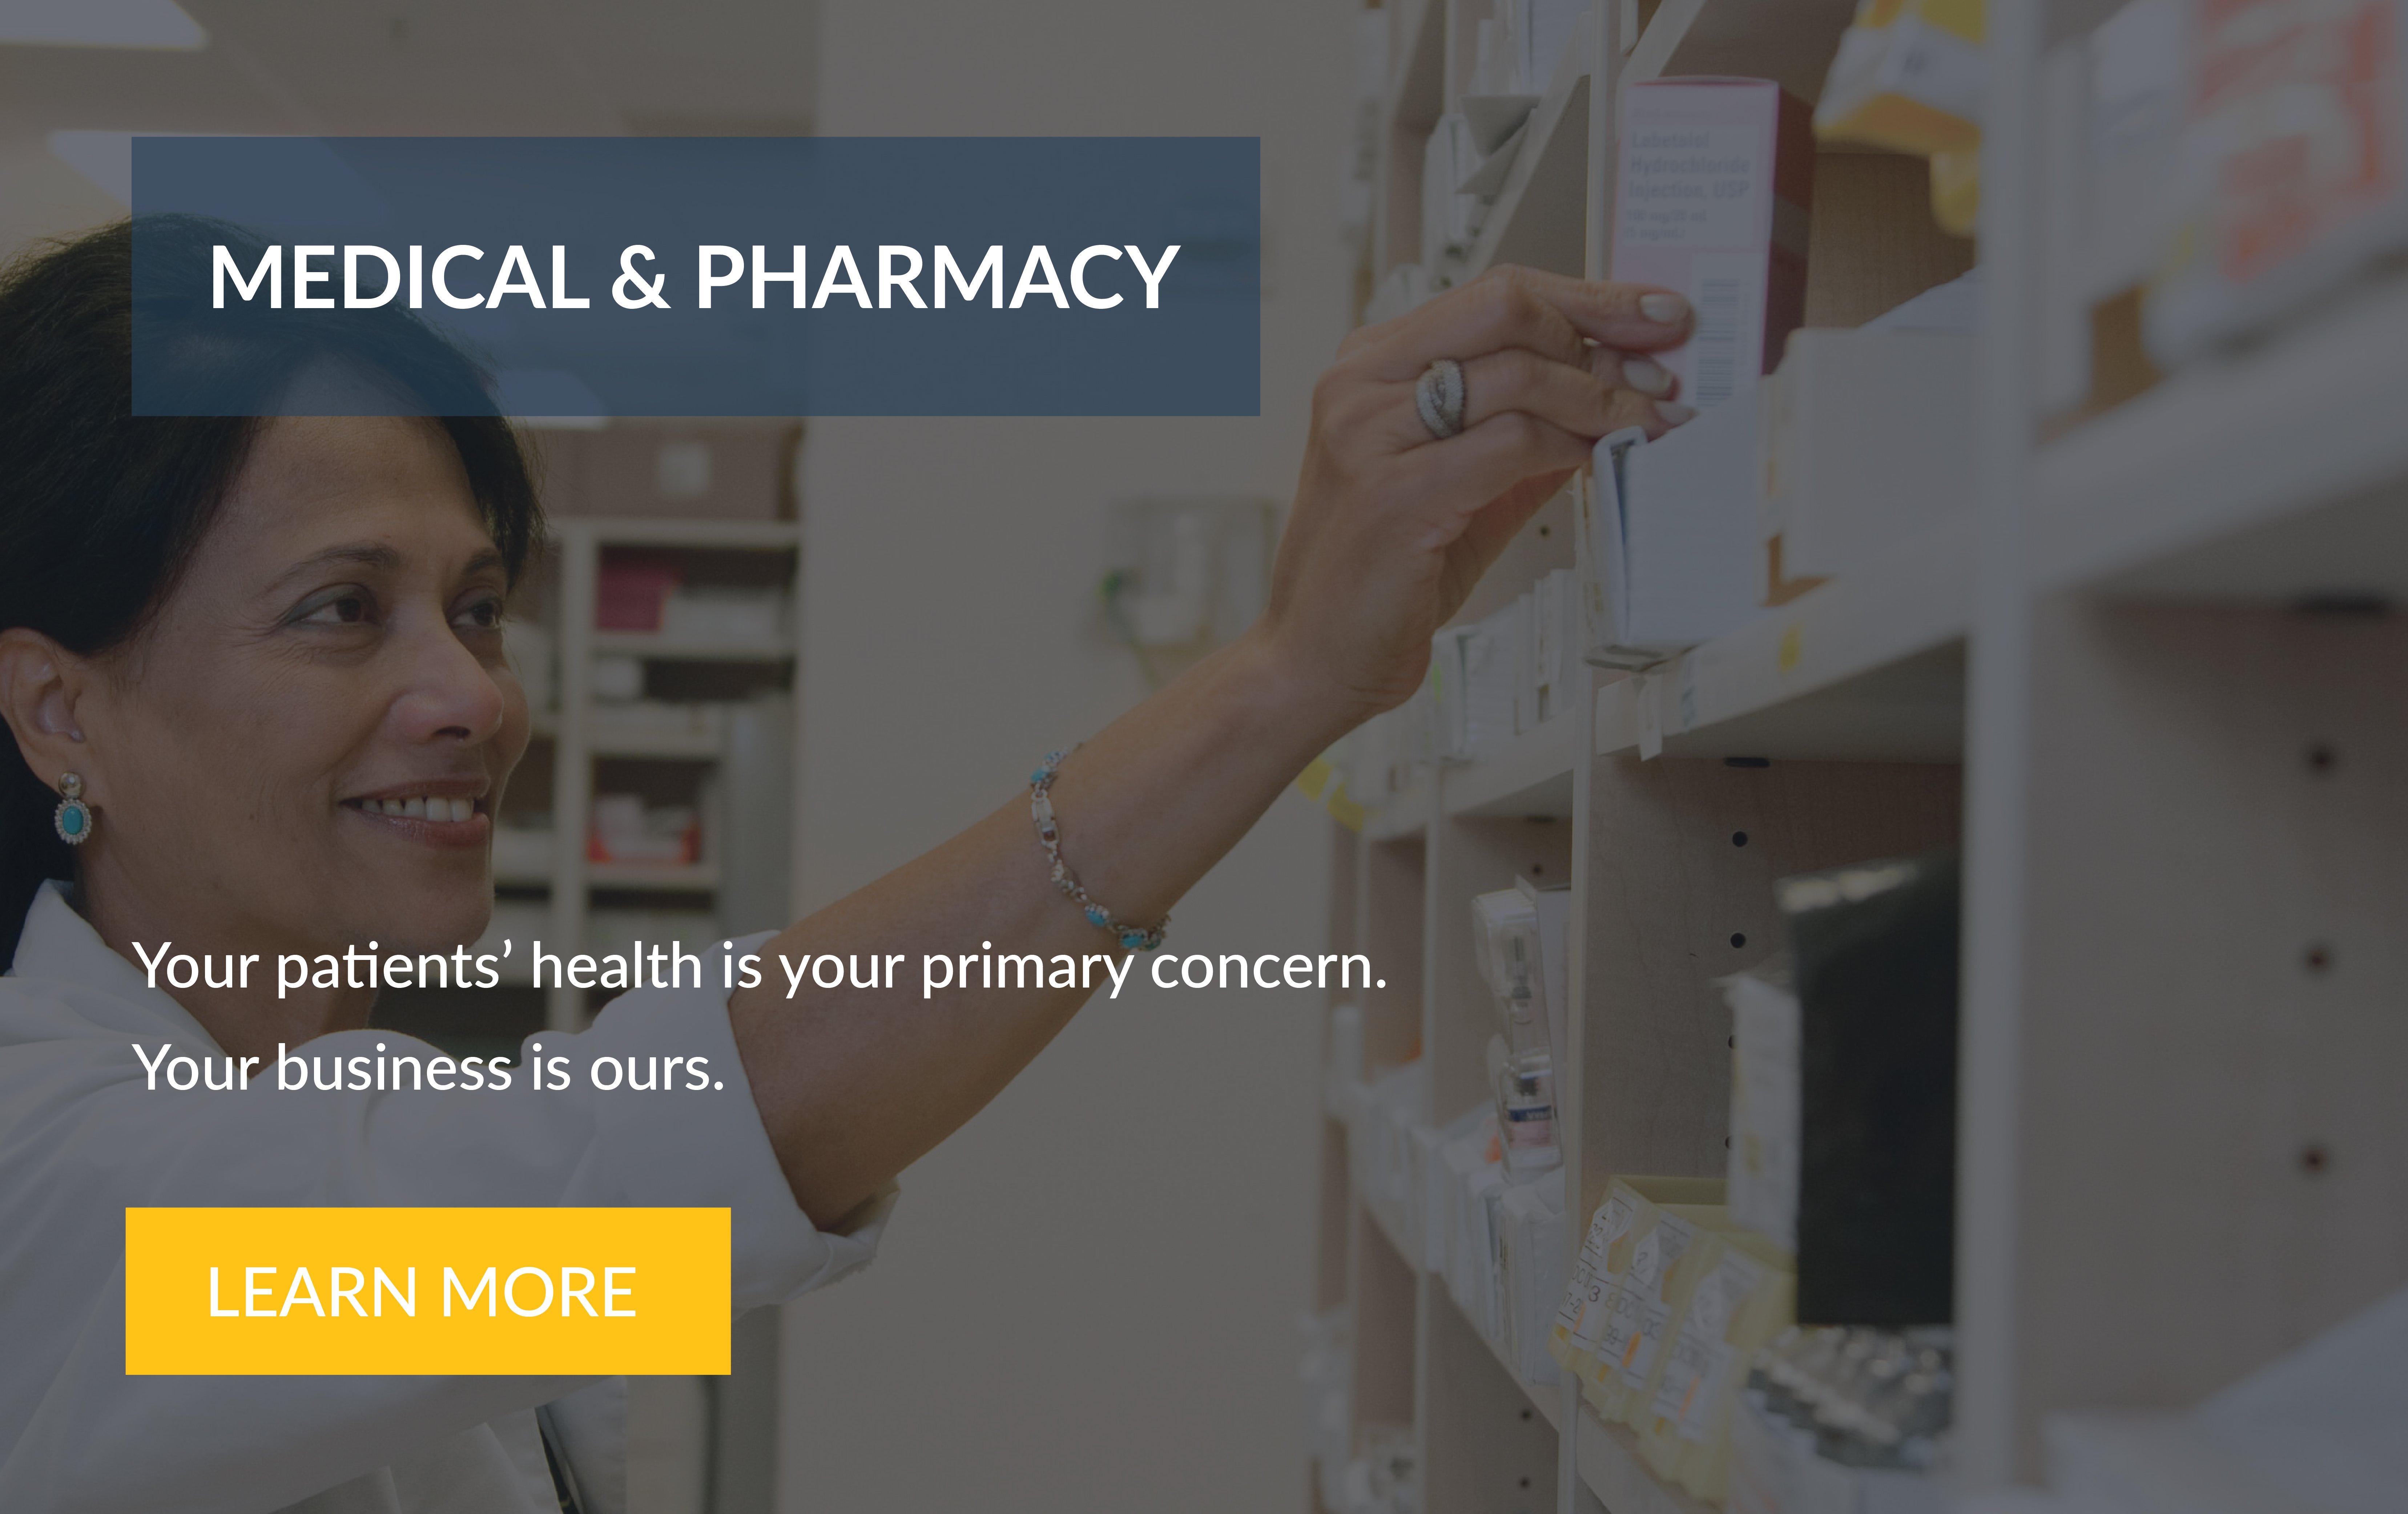 MEDICAL & PHARMACY